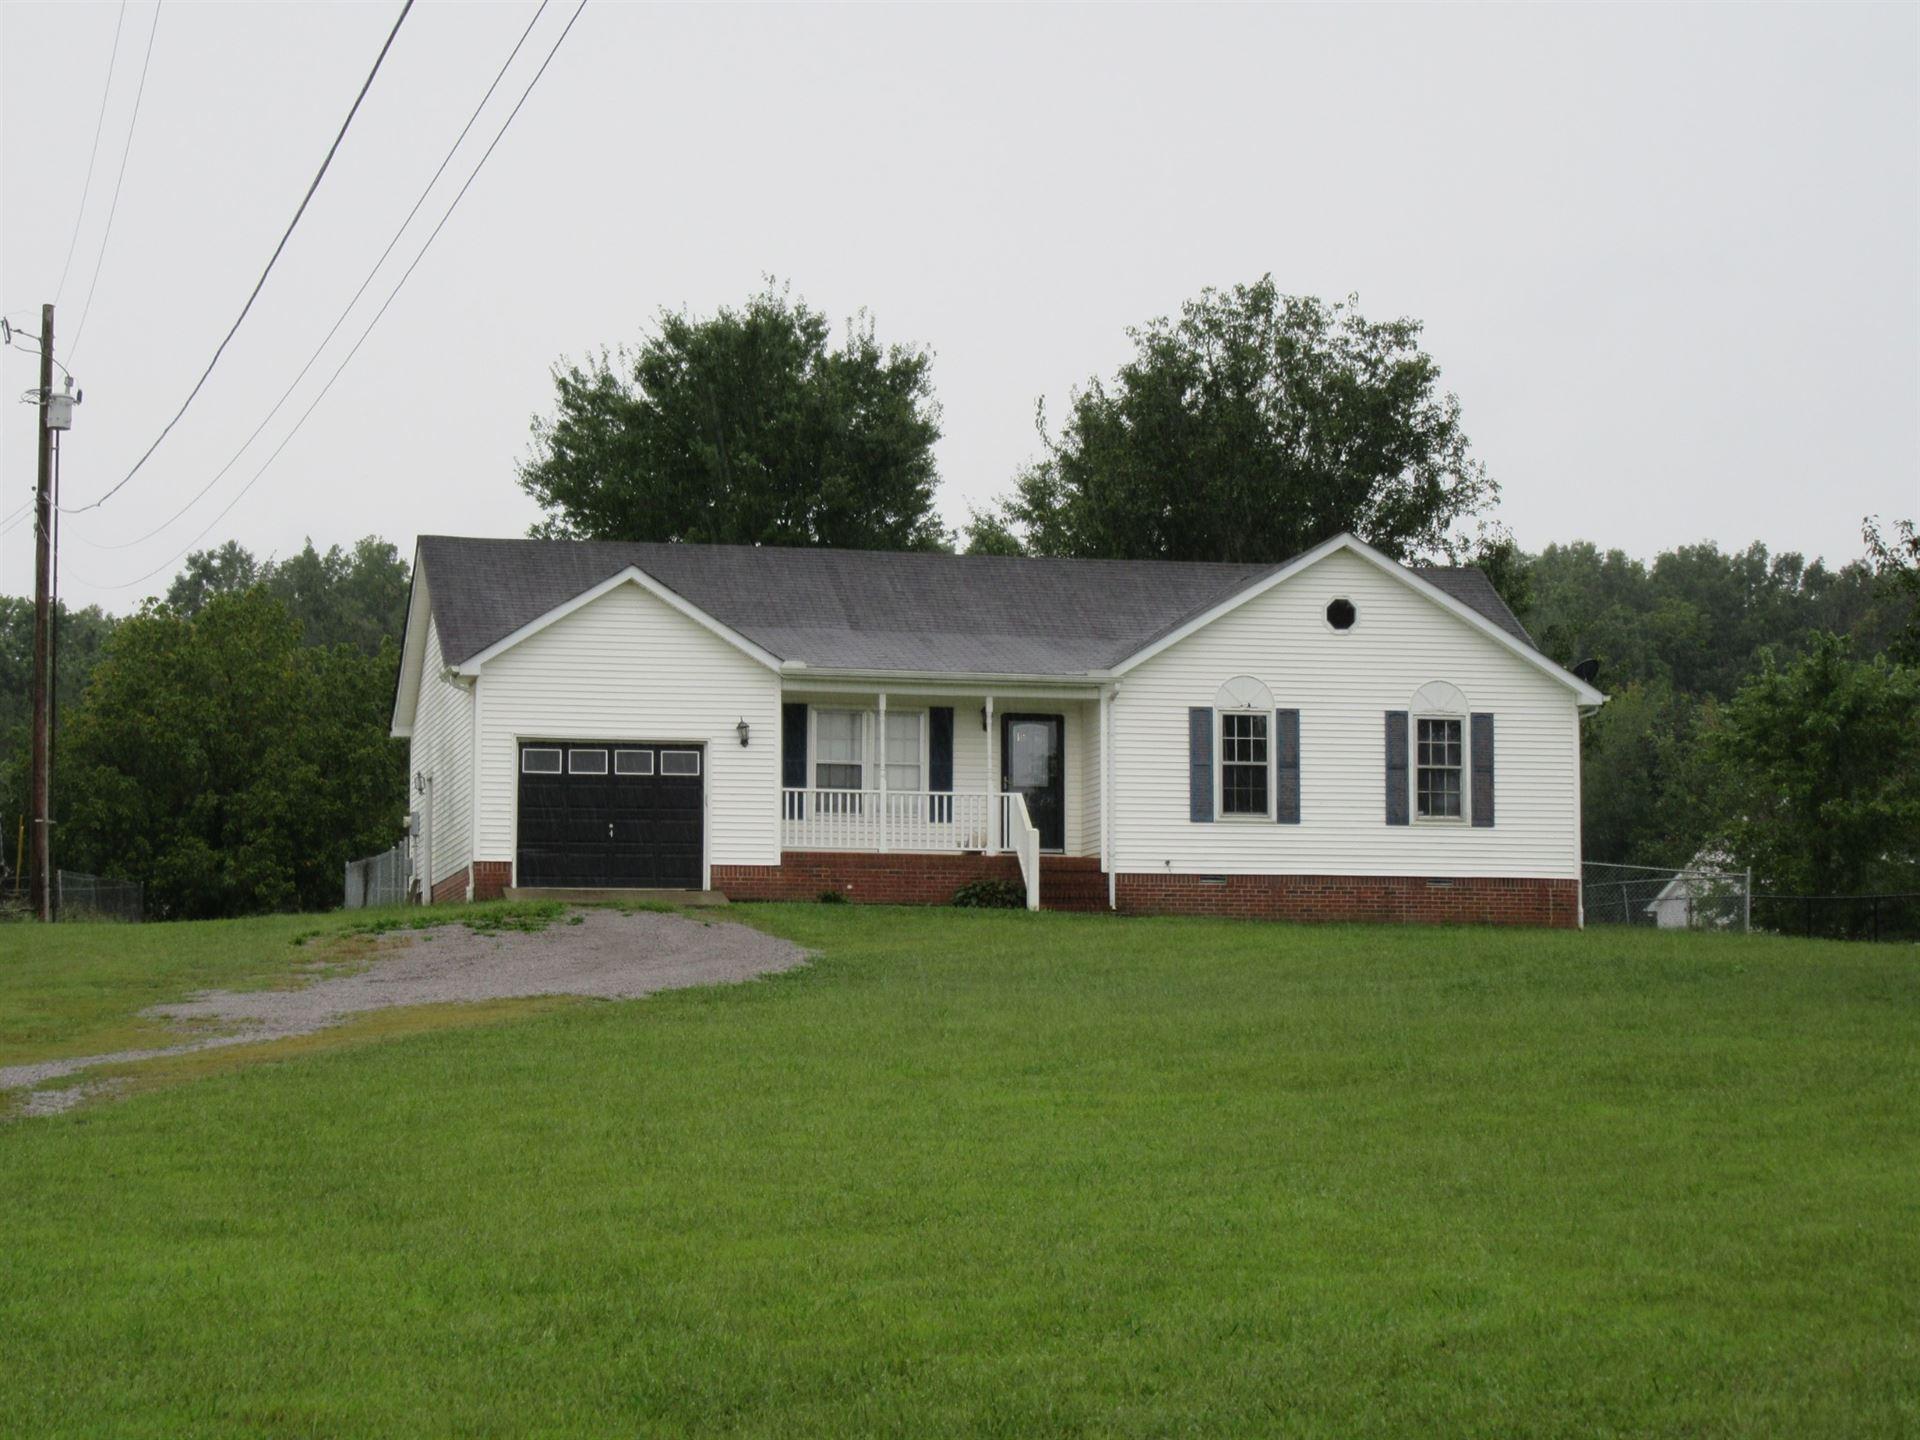 Photo of 6526 Halls Hill Pike, Murfreesboro, TN 37130 (MLS # 2292940)